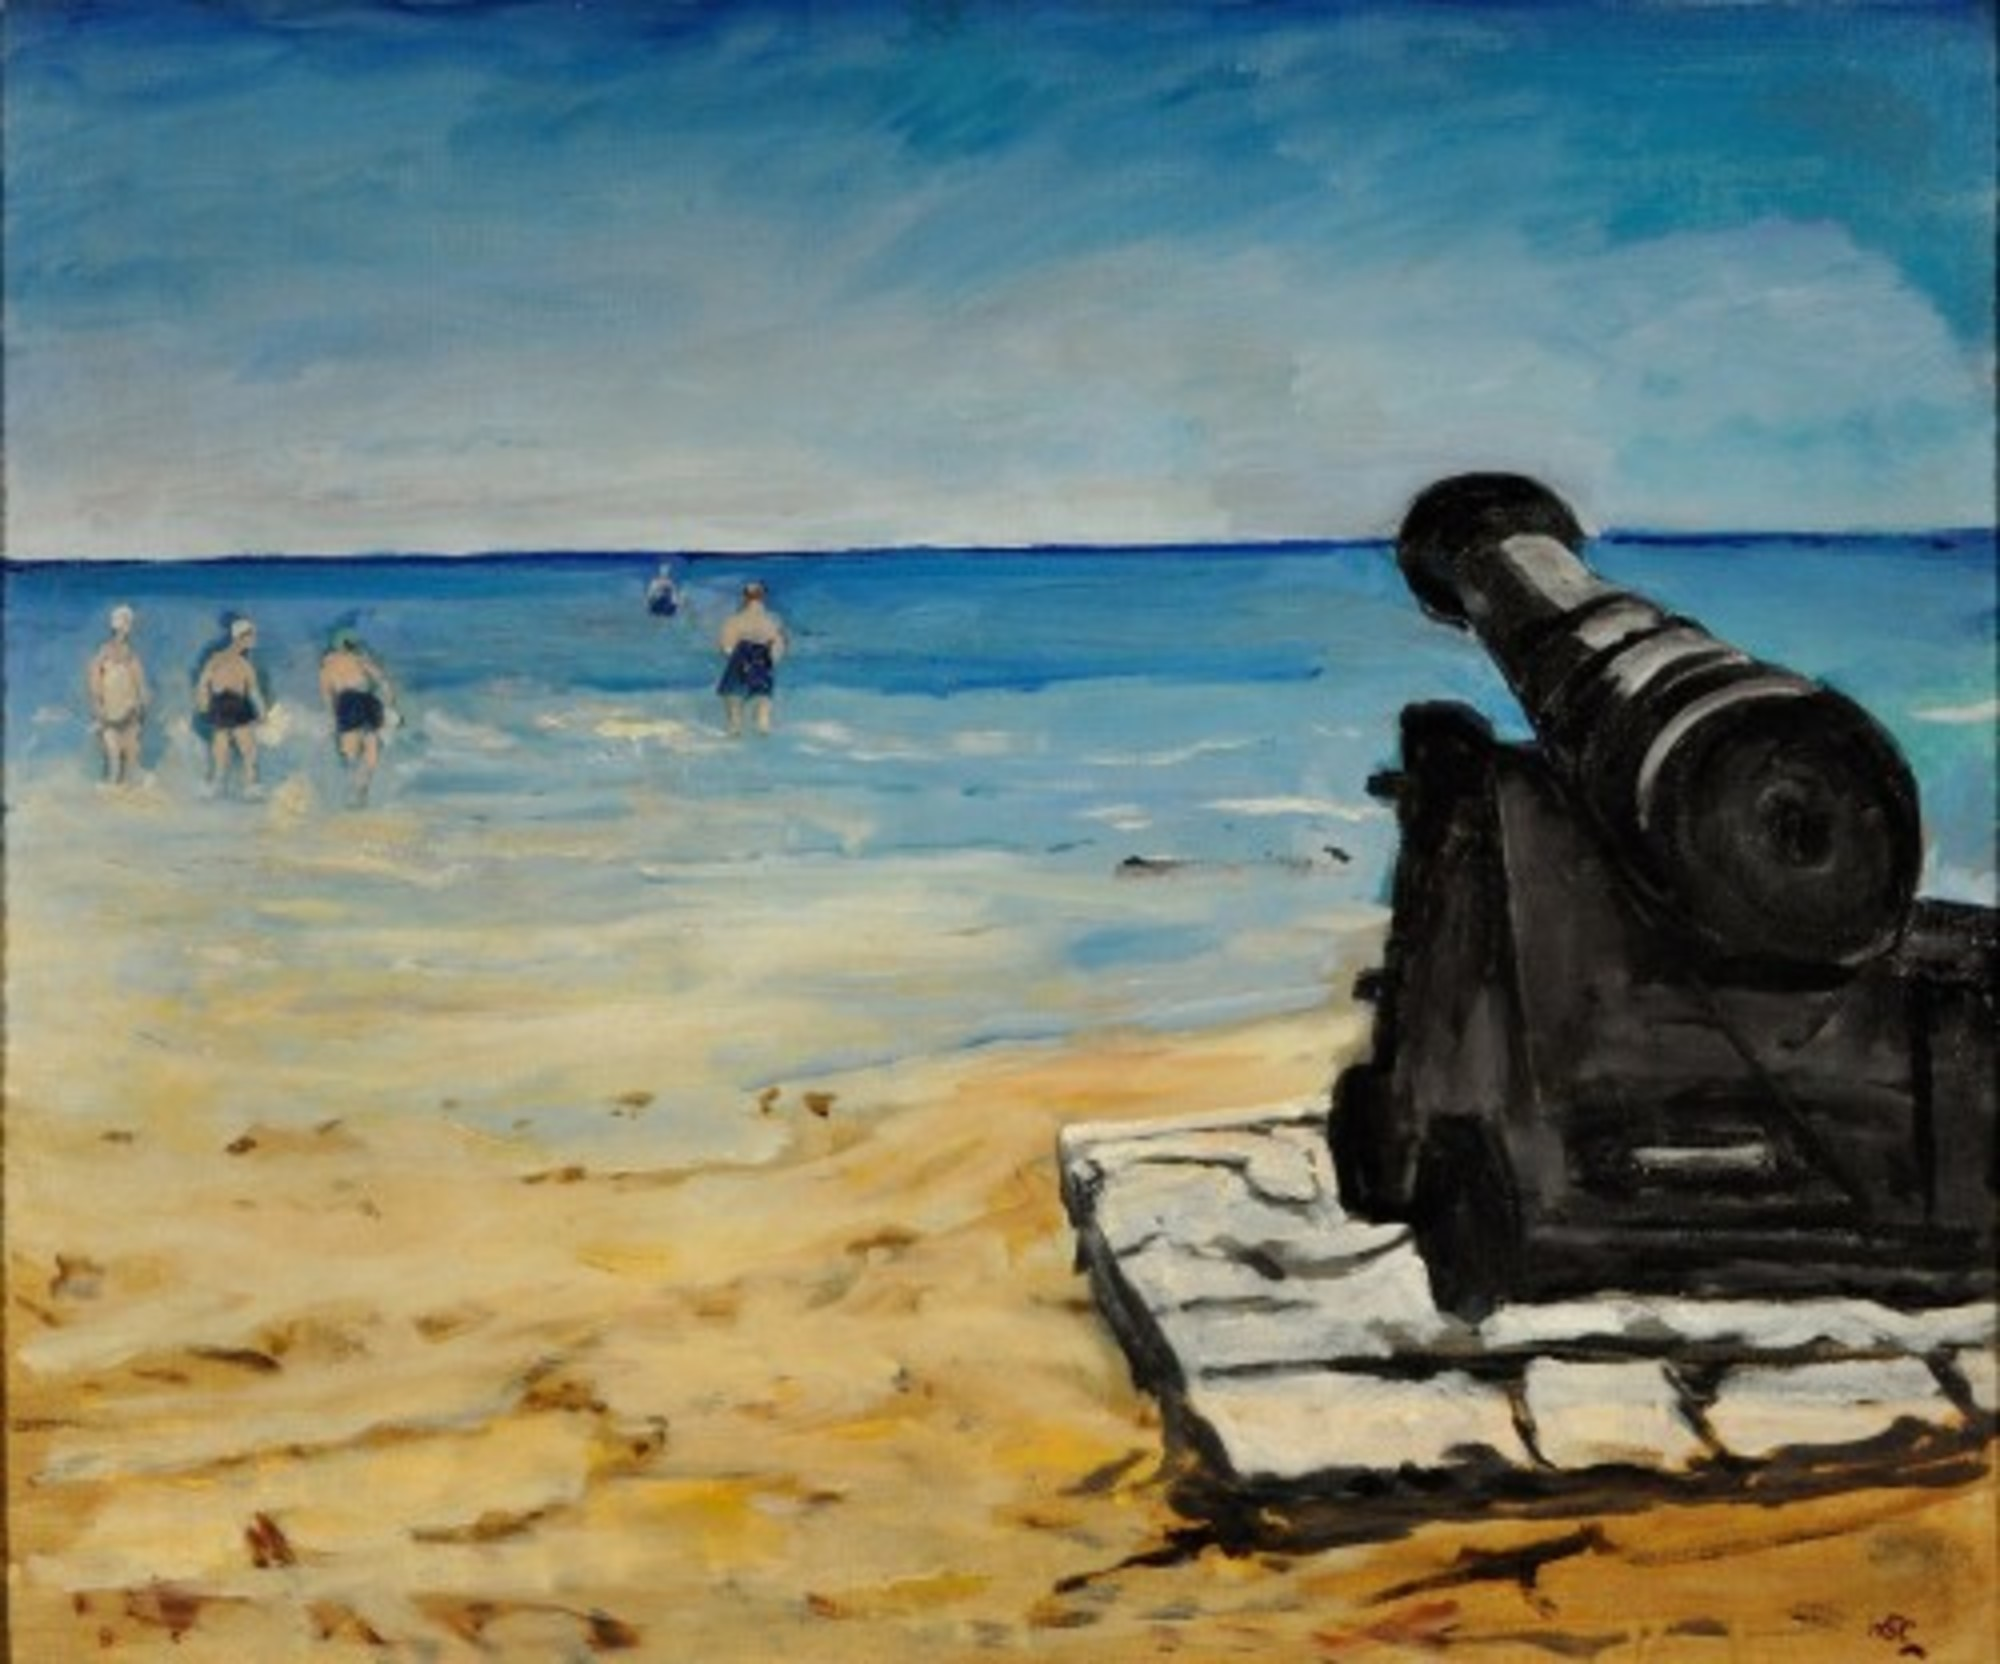 ss07-winston-churchill-painter-kempner-gallery-washington-st-louis.jpg